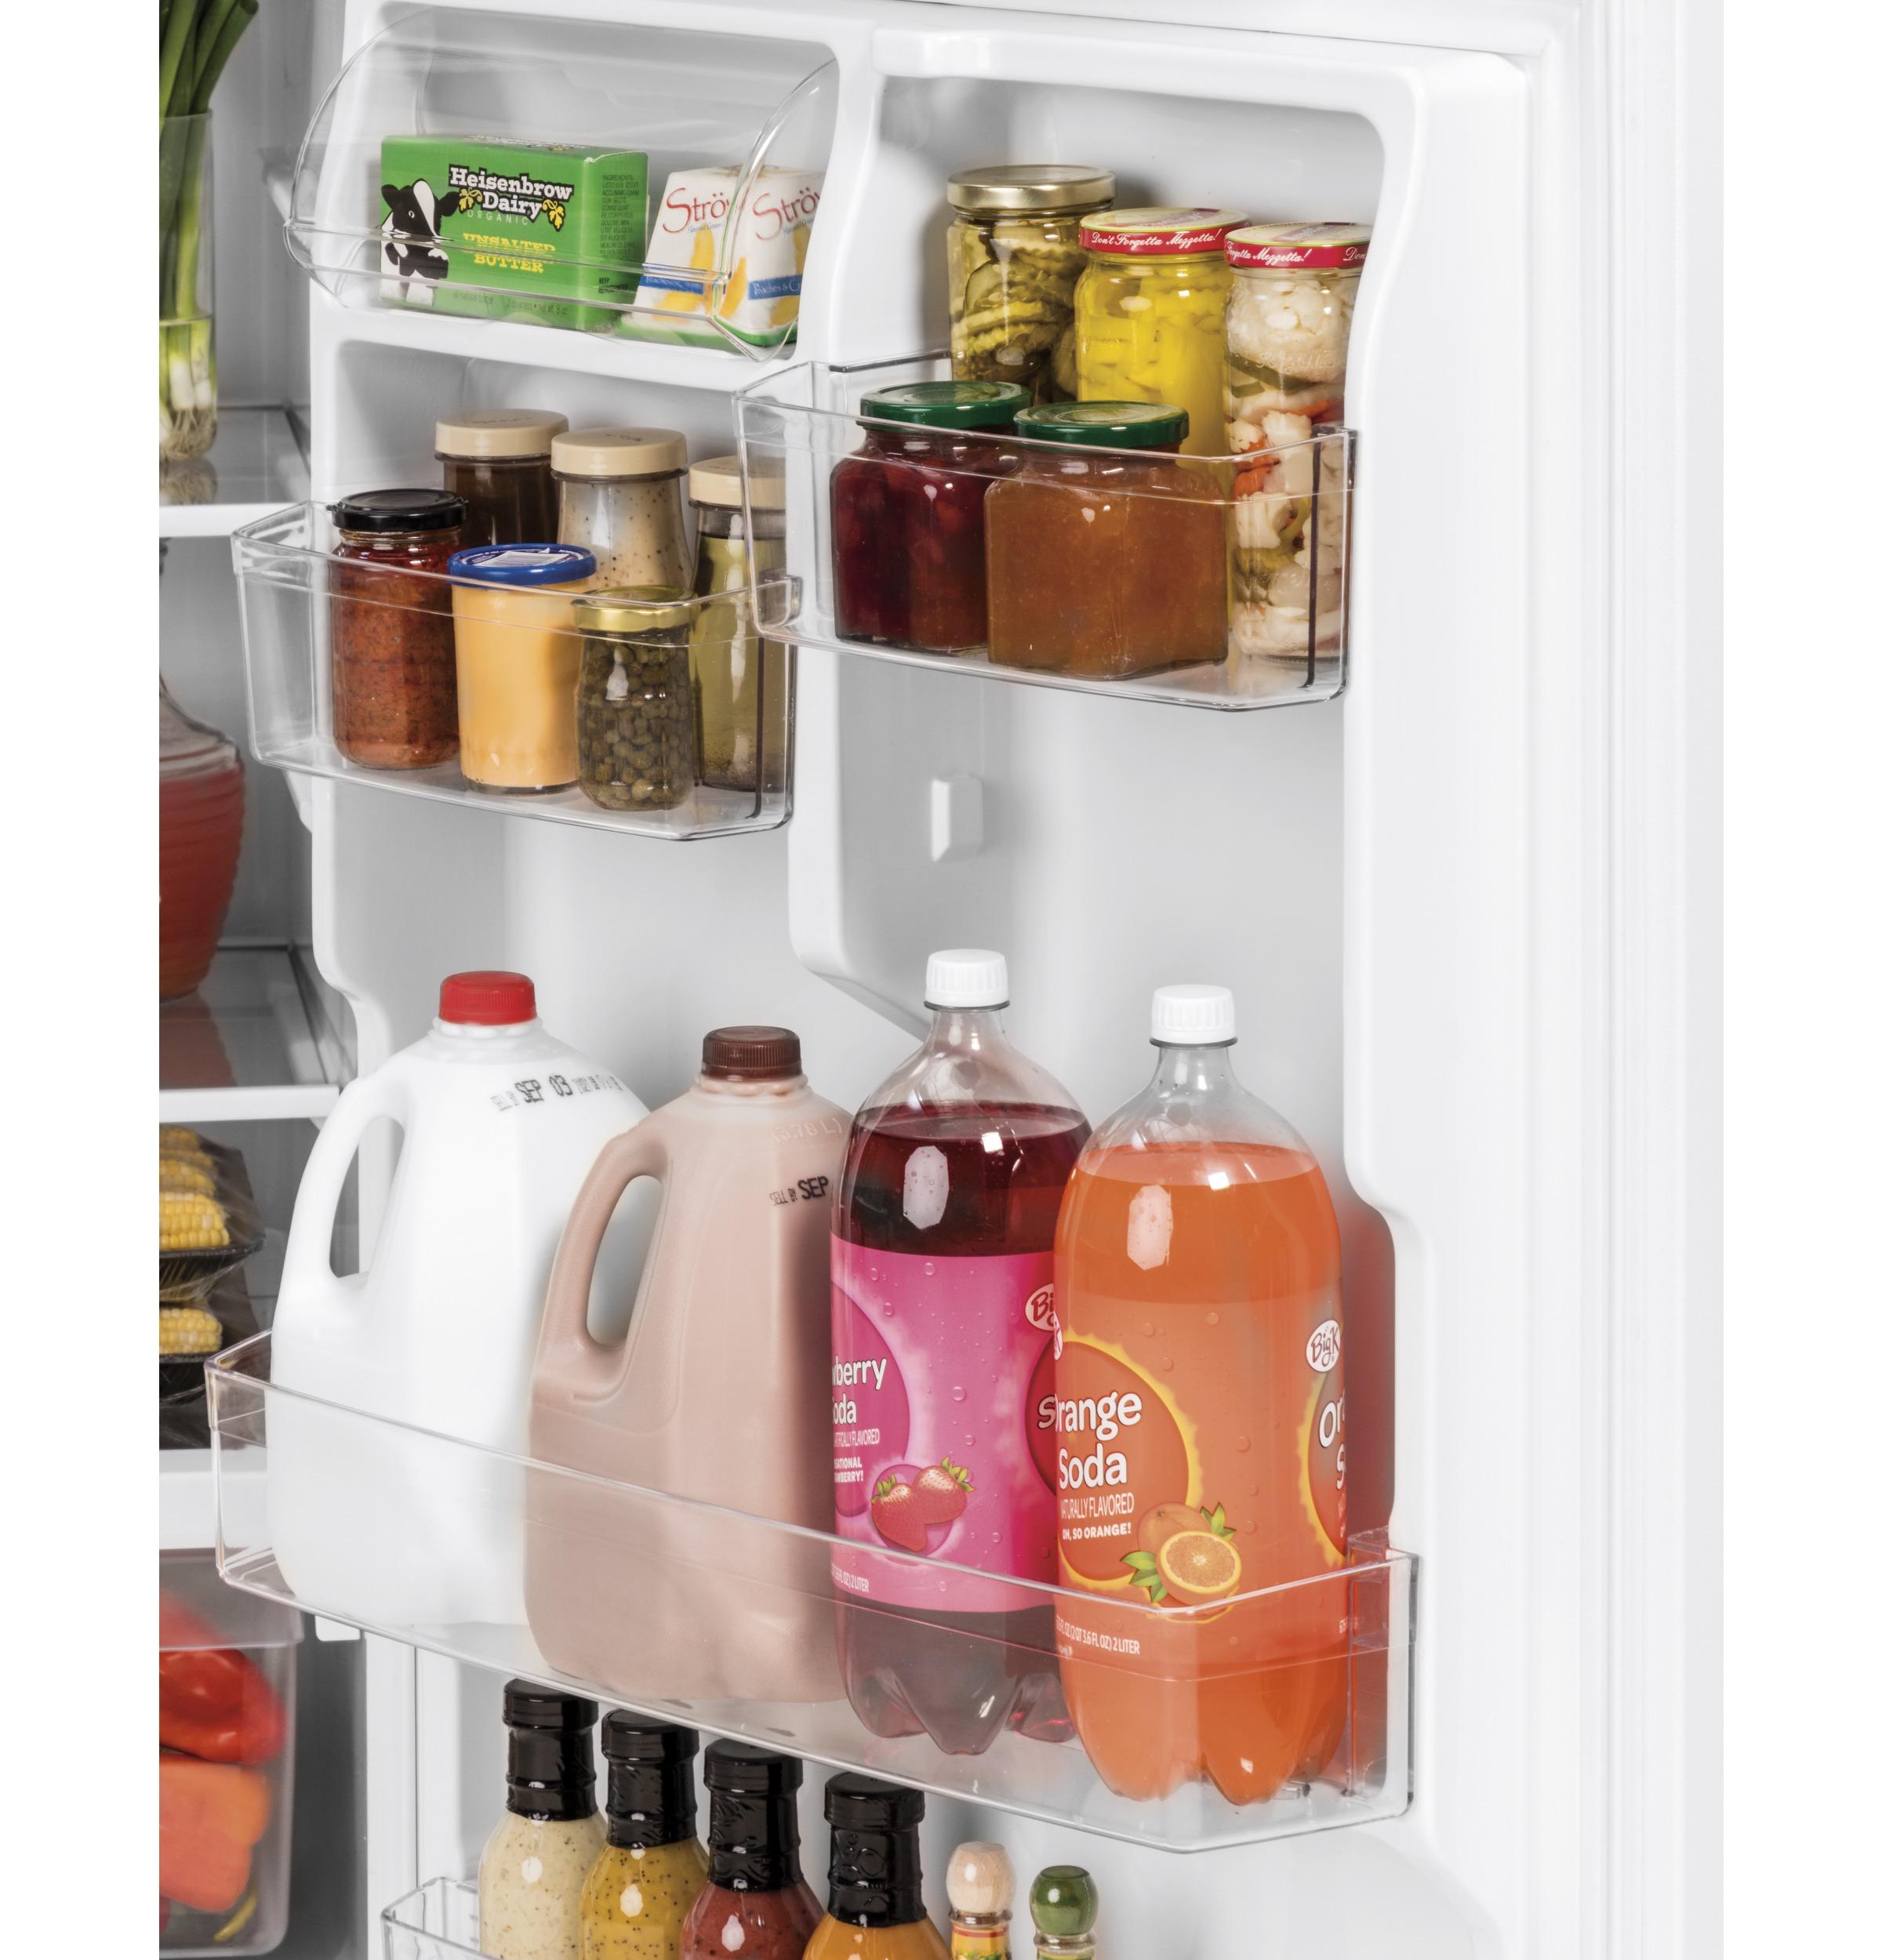 Model: GTS22KMNRES | GE GE® 21.9 Cu. Ft. Top-Freezer Refrigerator